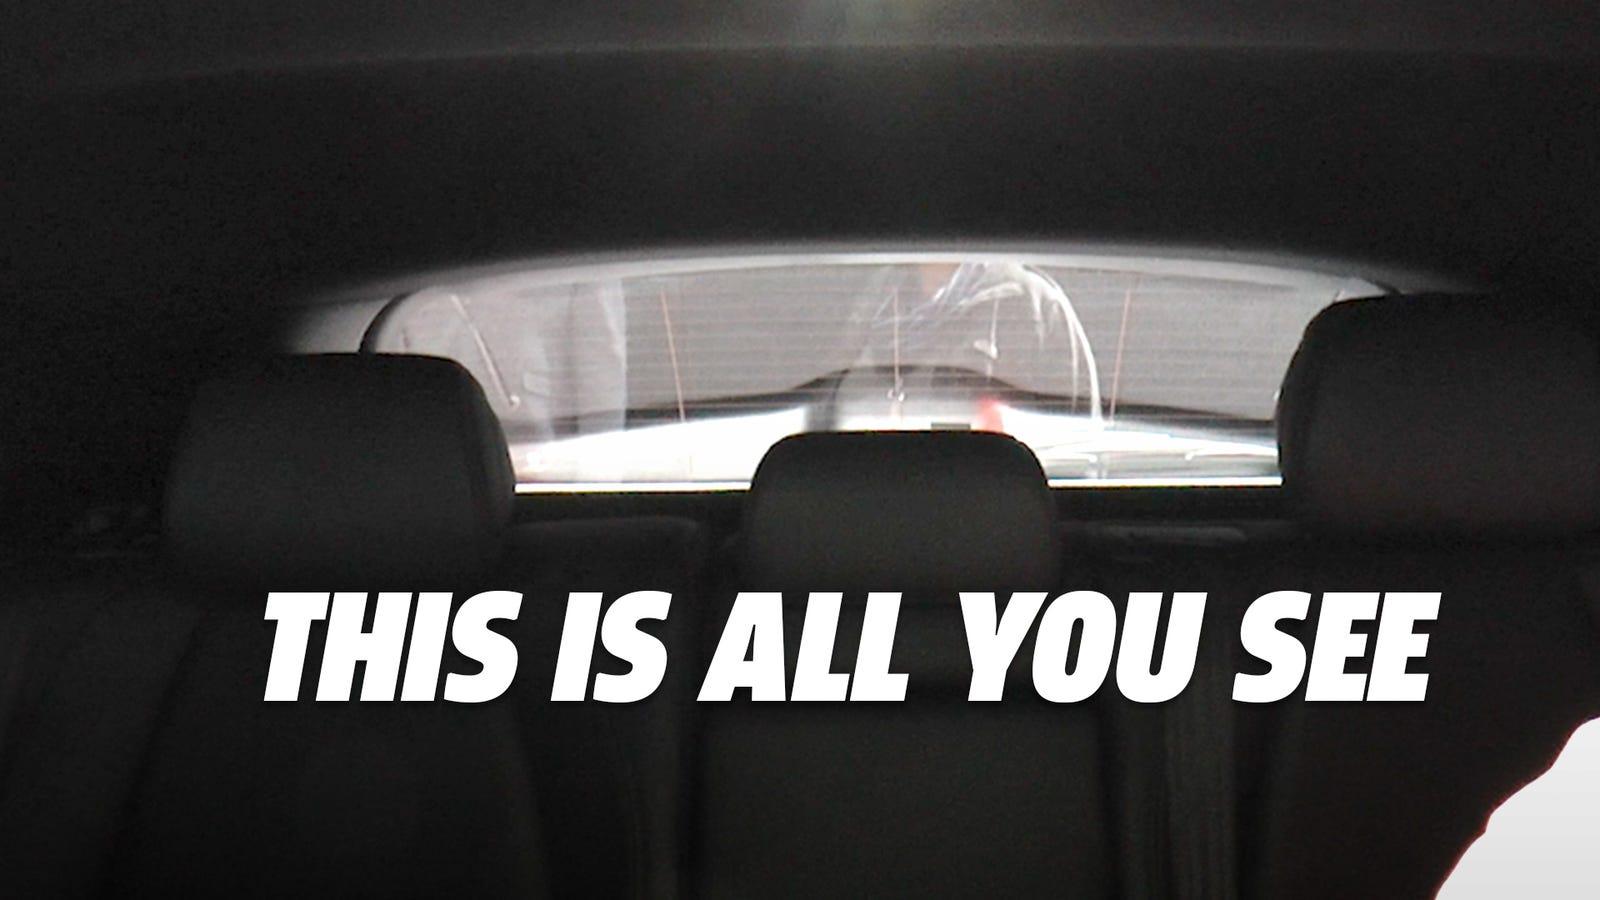 The 2019 Mazda 3 Hatch'